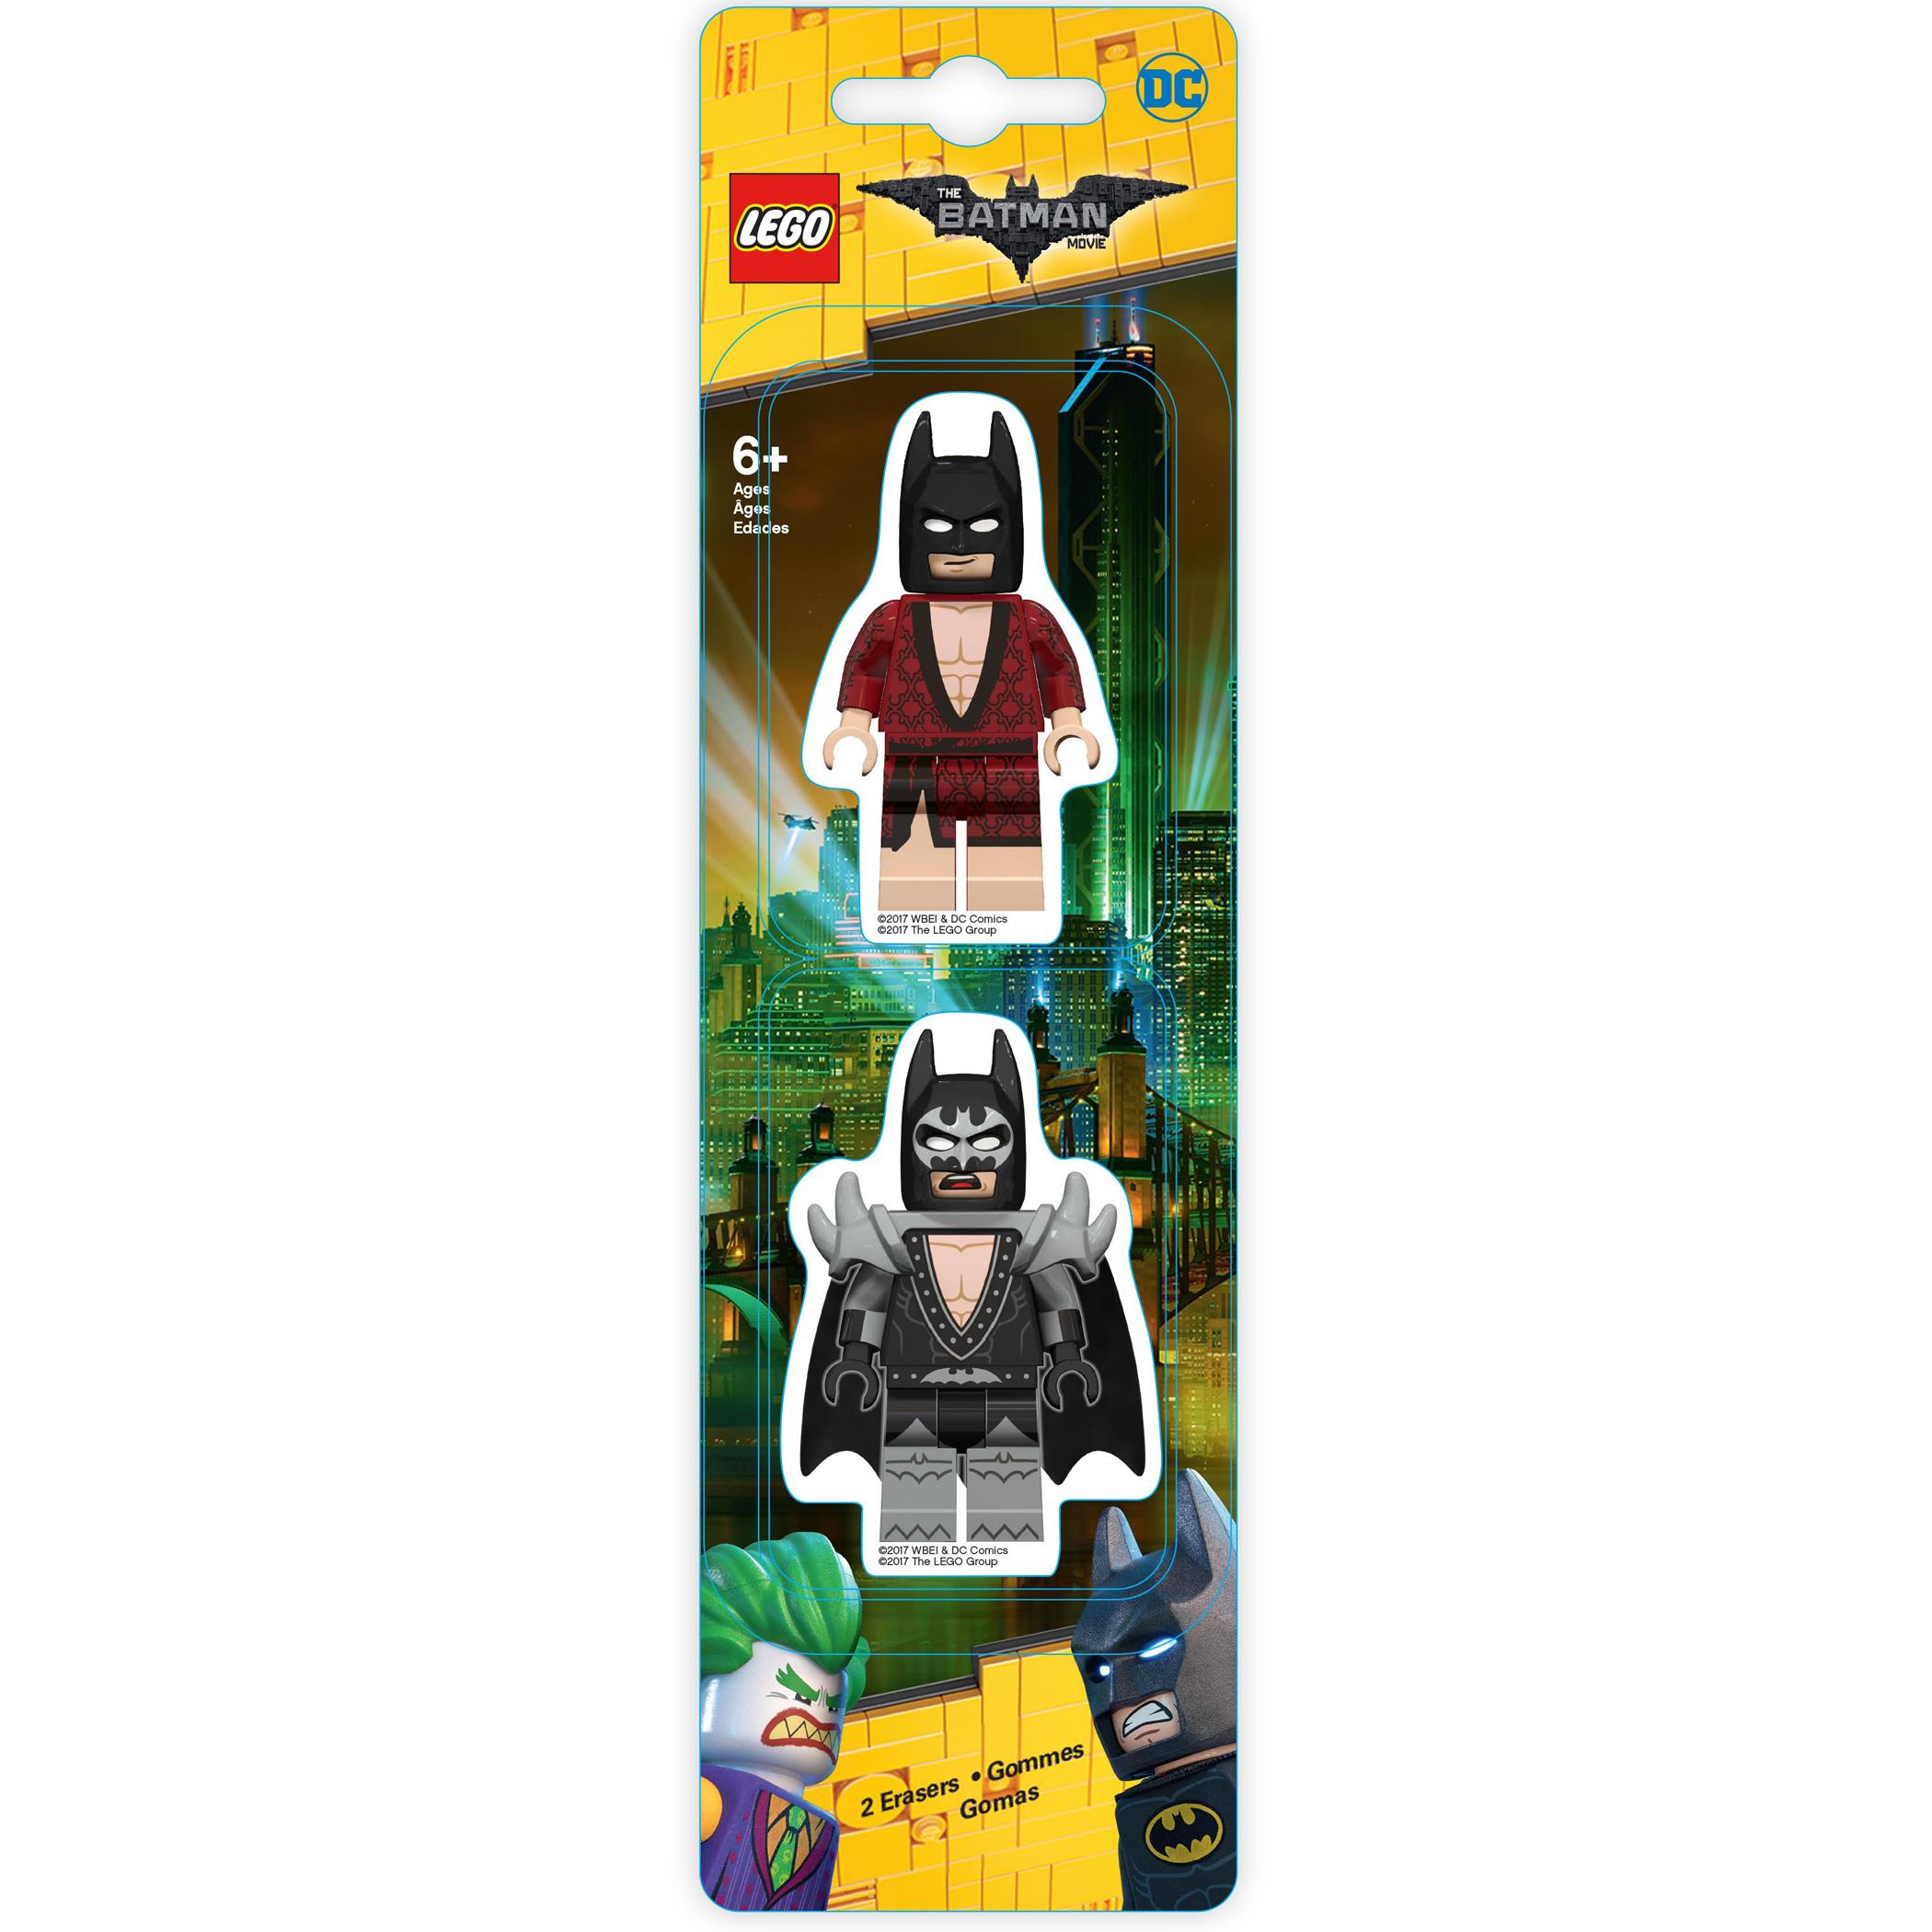 Набор ластиков (2 шт.) LEGO Batman Movie (Лего Фильм: Бэтмен)- Kimono Batman/Glam Rocker Batman (51758)